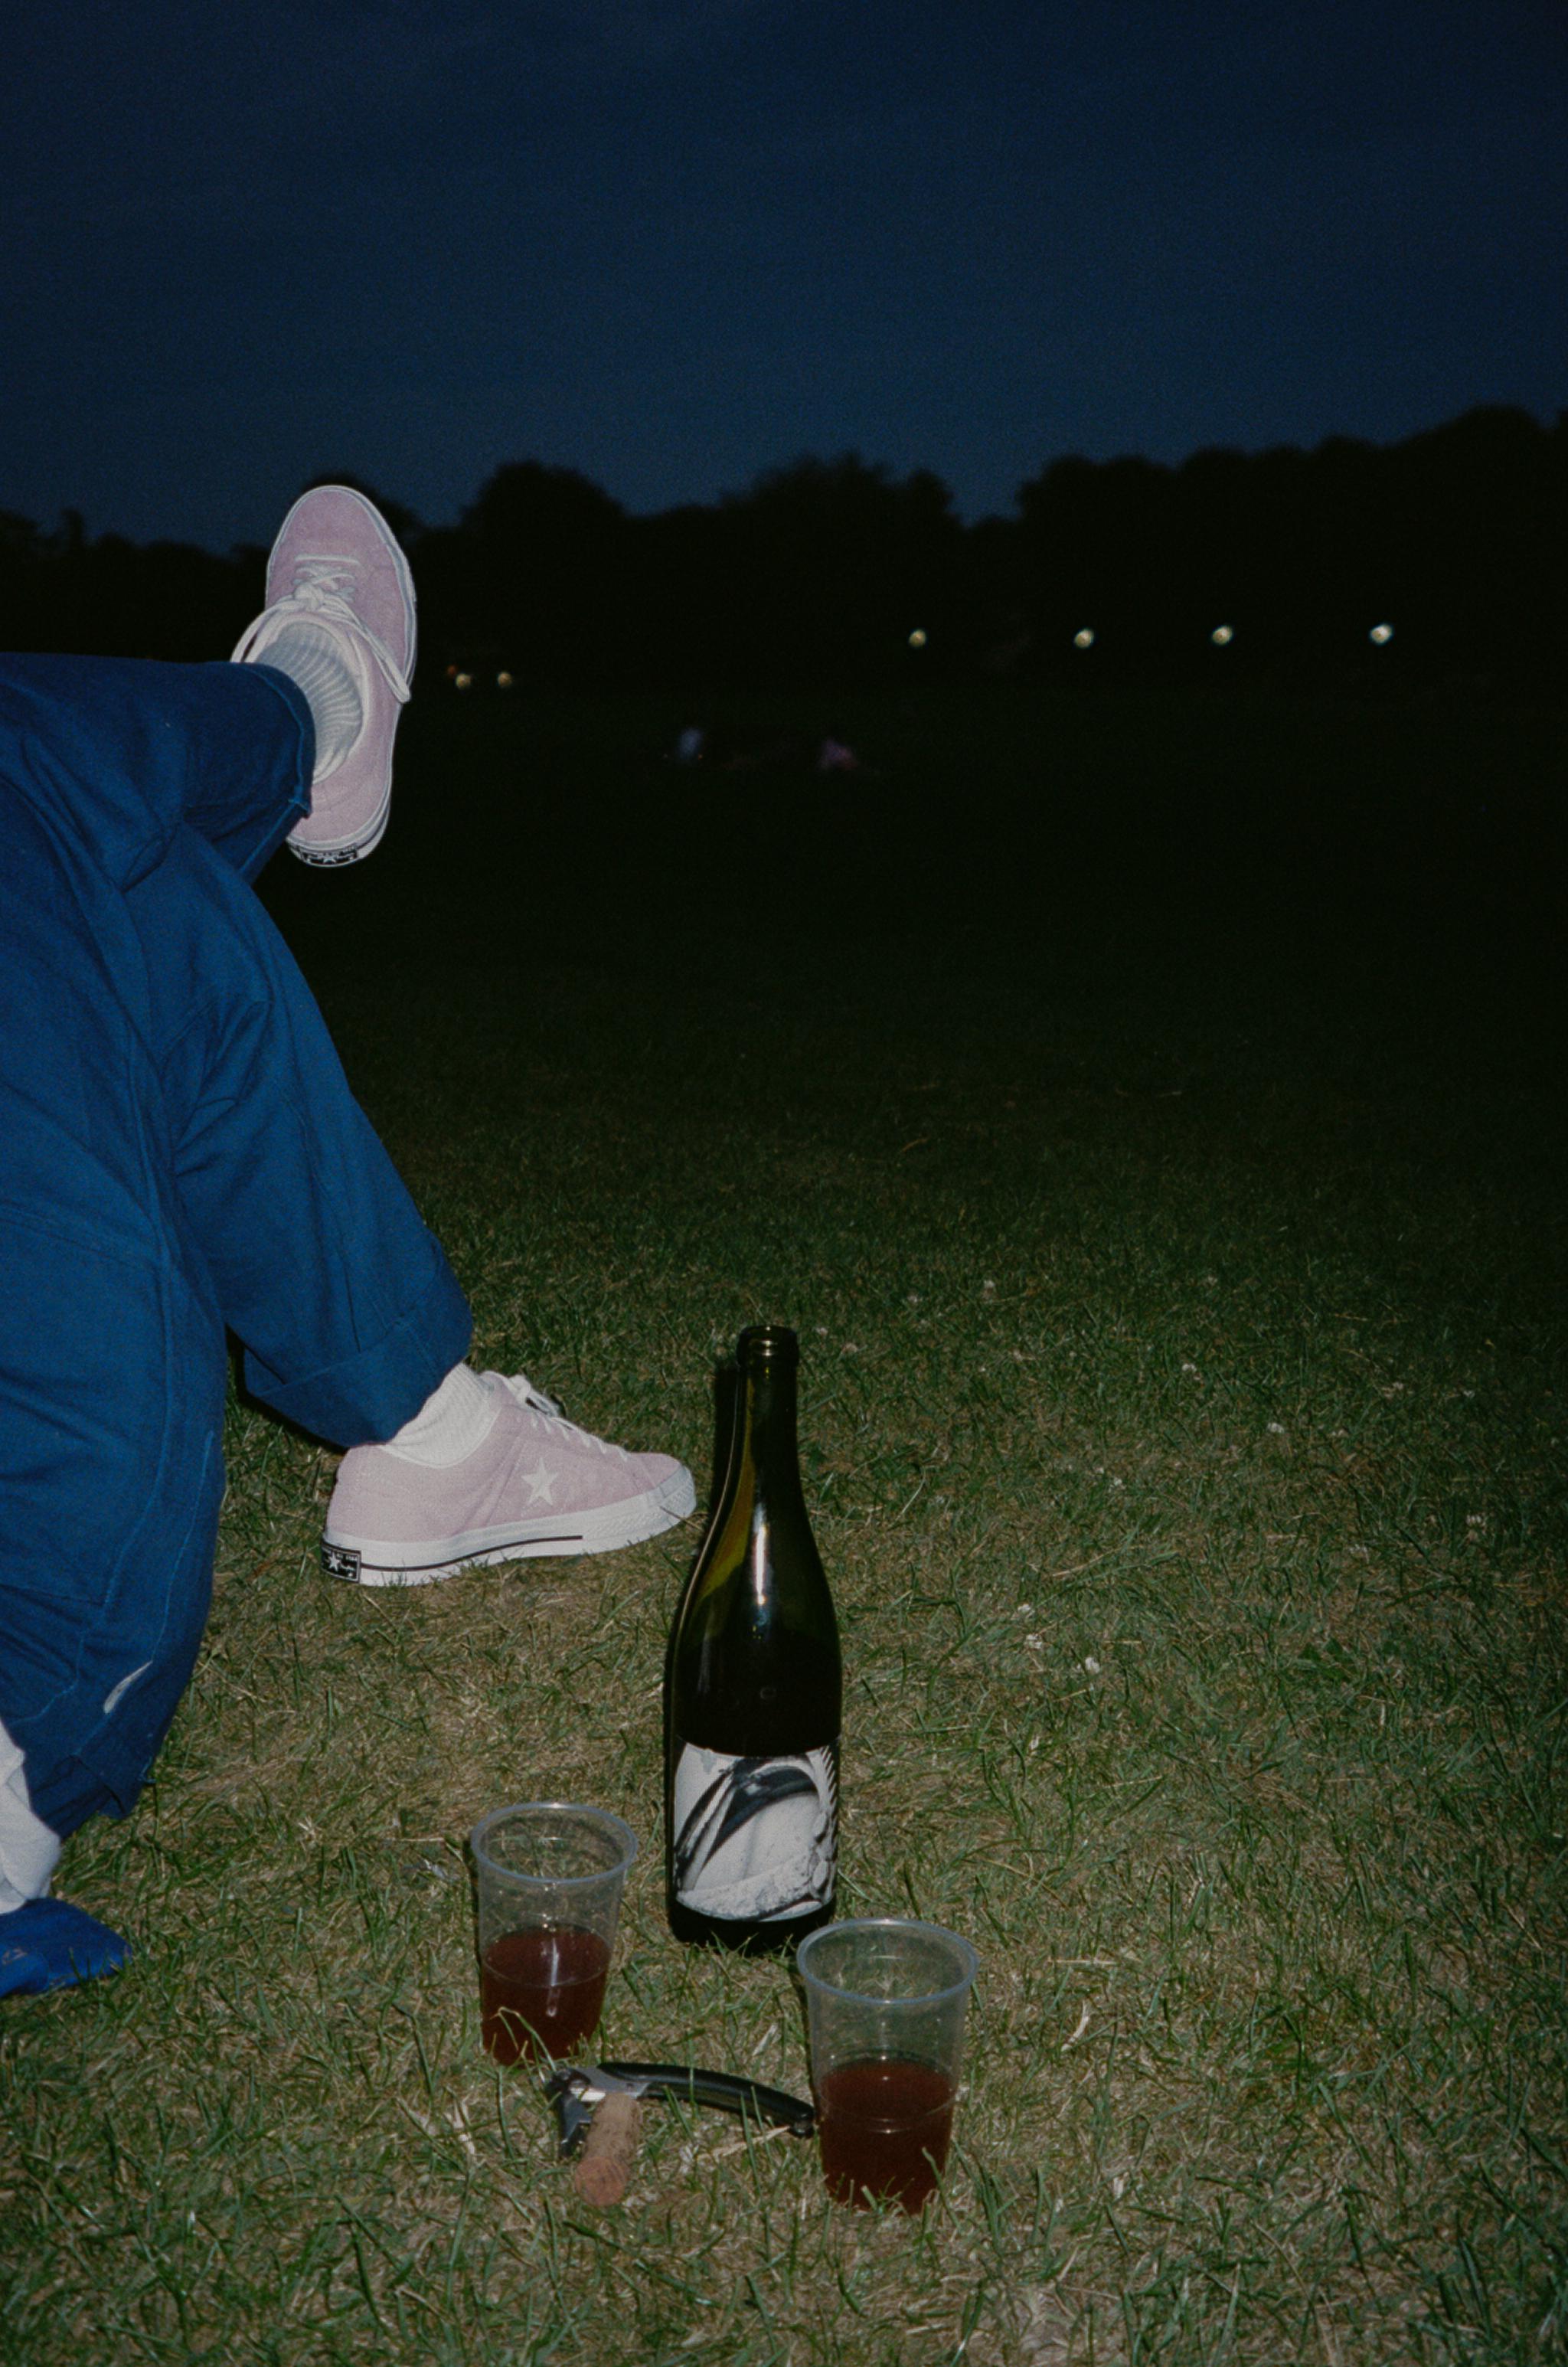 Wine at The Common with Brad, Saffron Walden, 2019